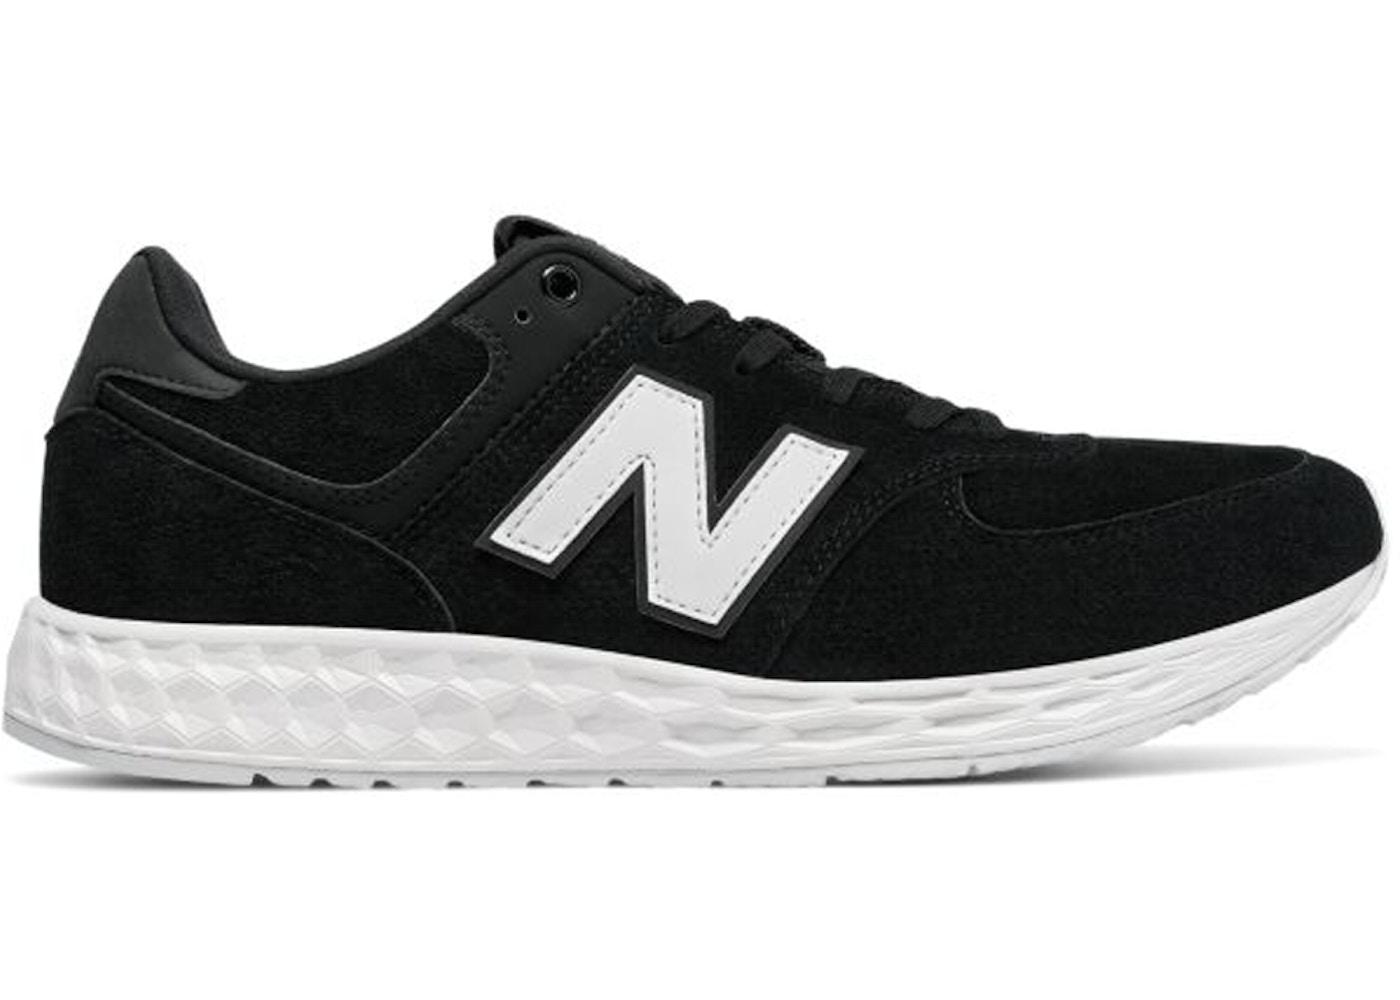 New Balance 574 Fresh Foam Suede Black White